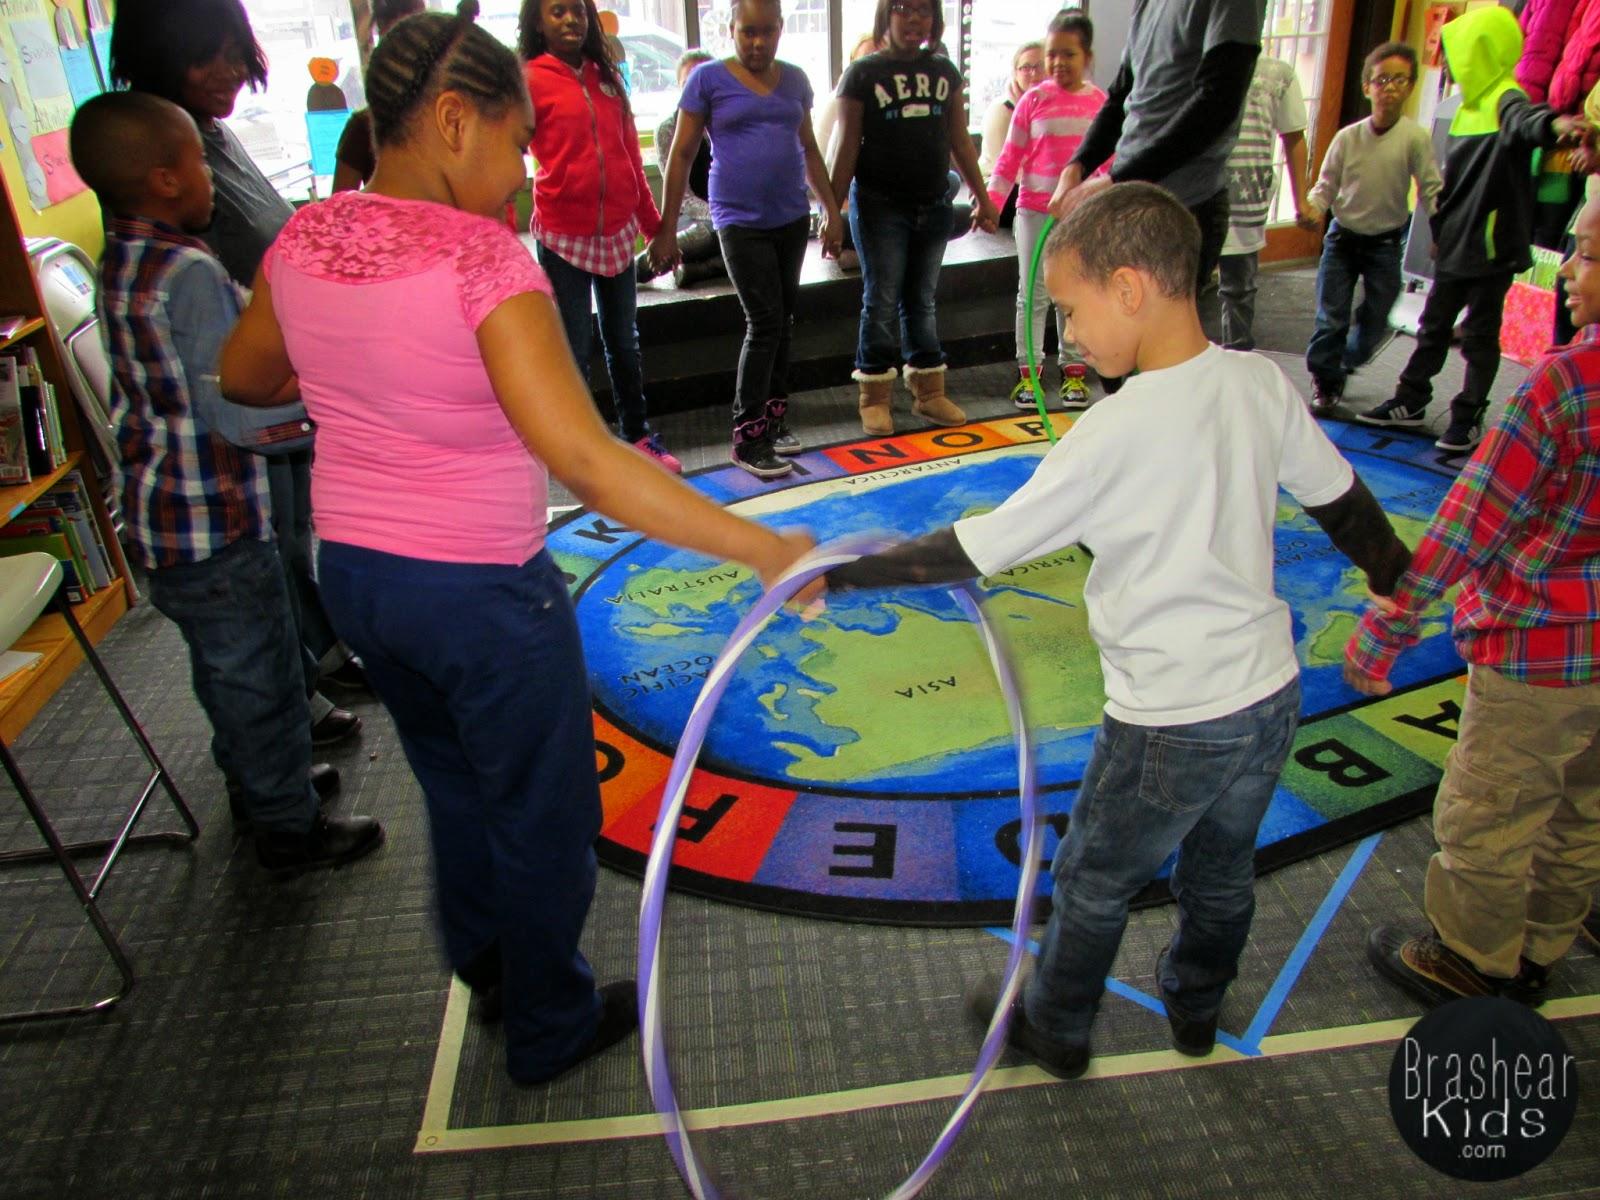 The Brashear Kids: Three Teamwork Games